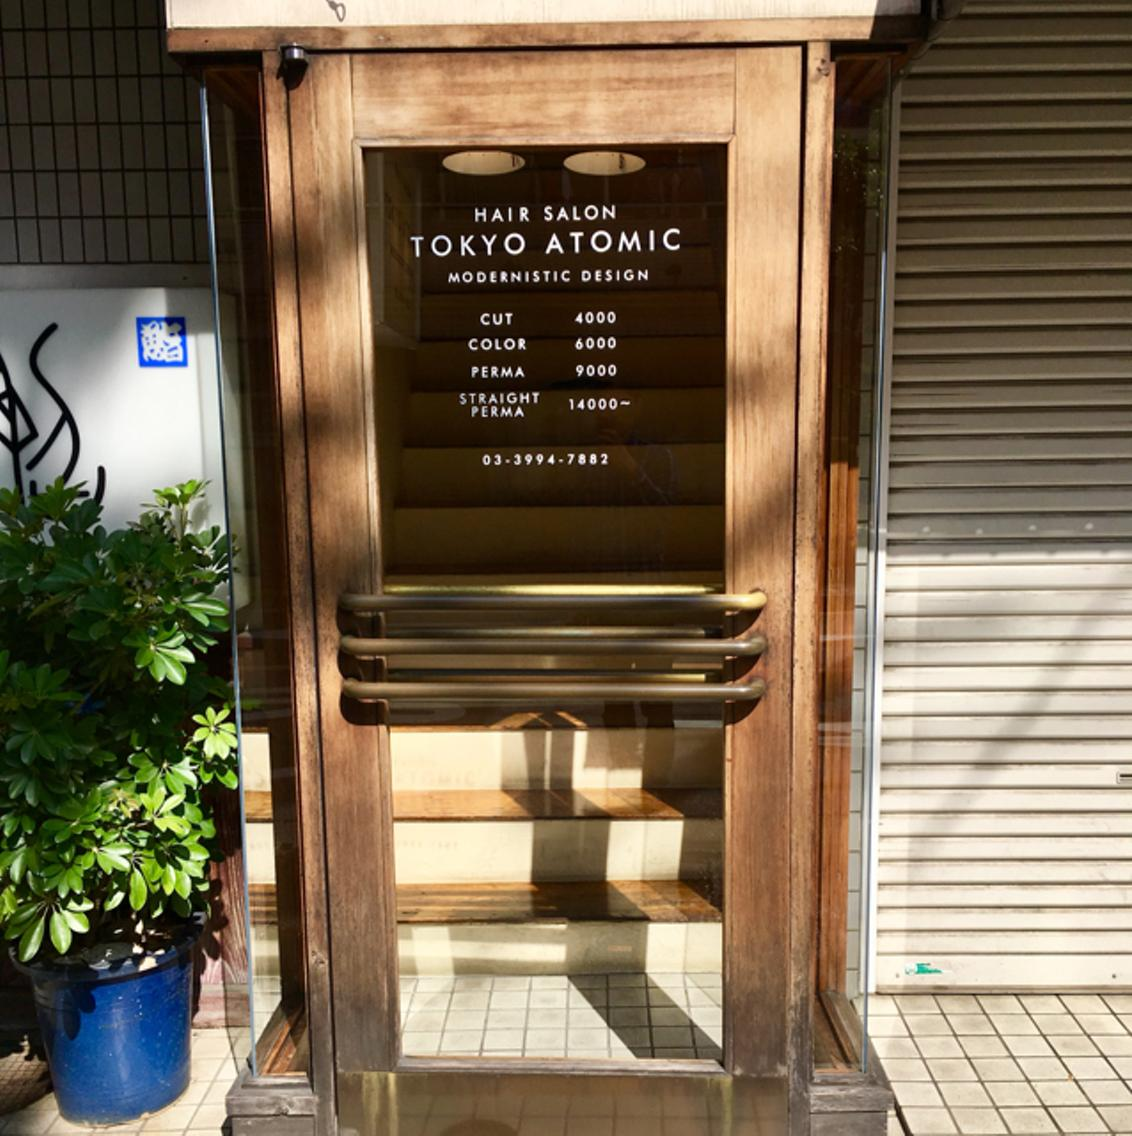 ✂️🔥【当日予約OK】🔥✂️落ち着いた空間でシンプルなデザインを 桜台駅から徒歩3分☀️#ANTIQUE#Modern#🇺🇸🇬🇧